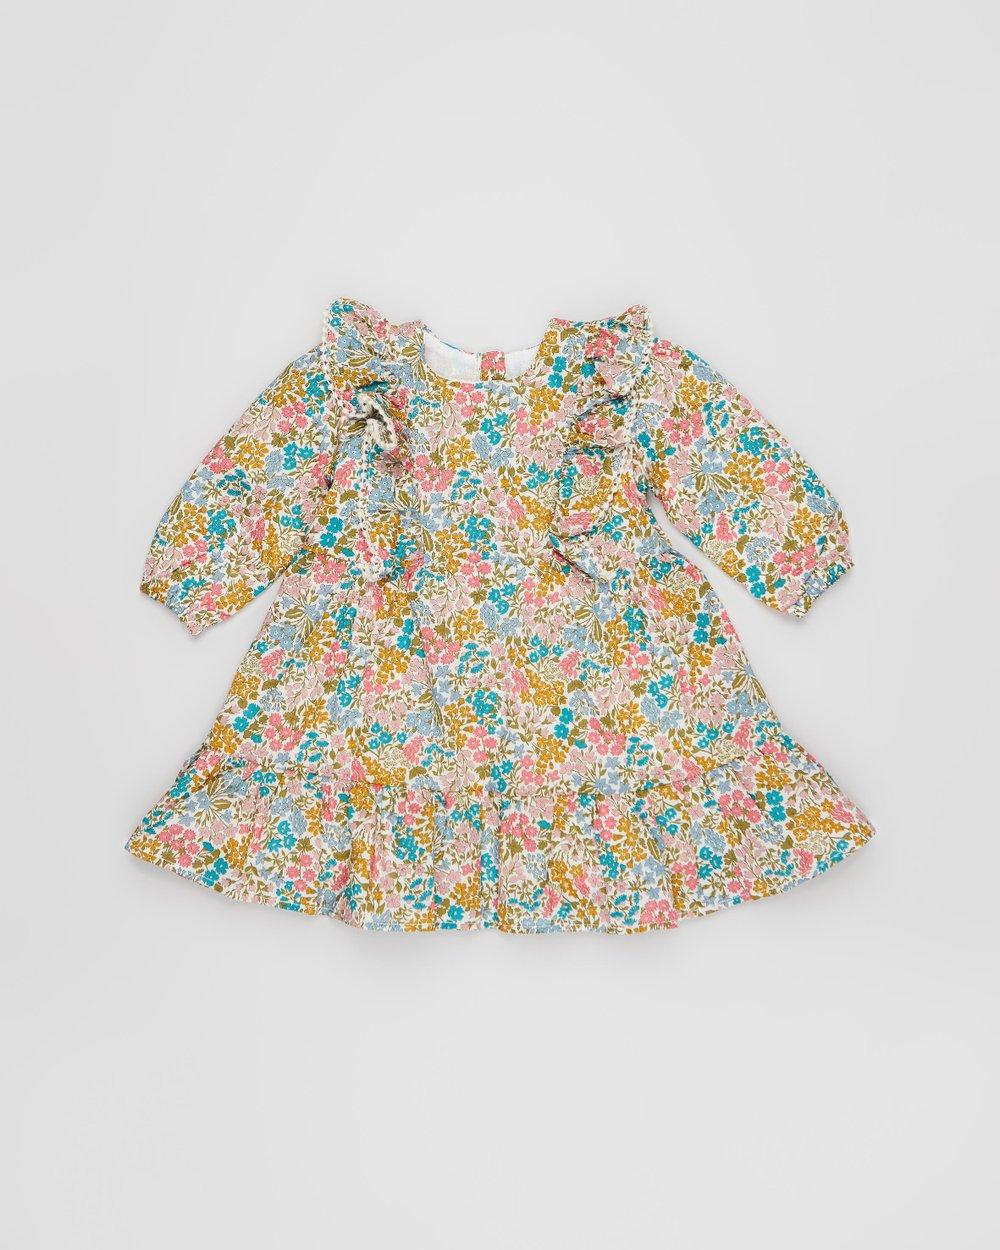 querido conjunto desaparecer  Liberty Frill Dress - Babies by Bebe by Minihaha Online | Oft-gov |  Australia